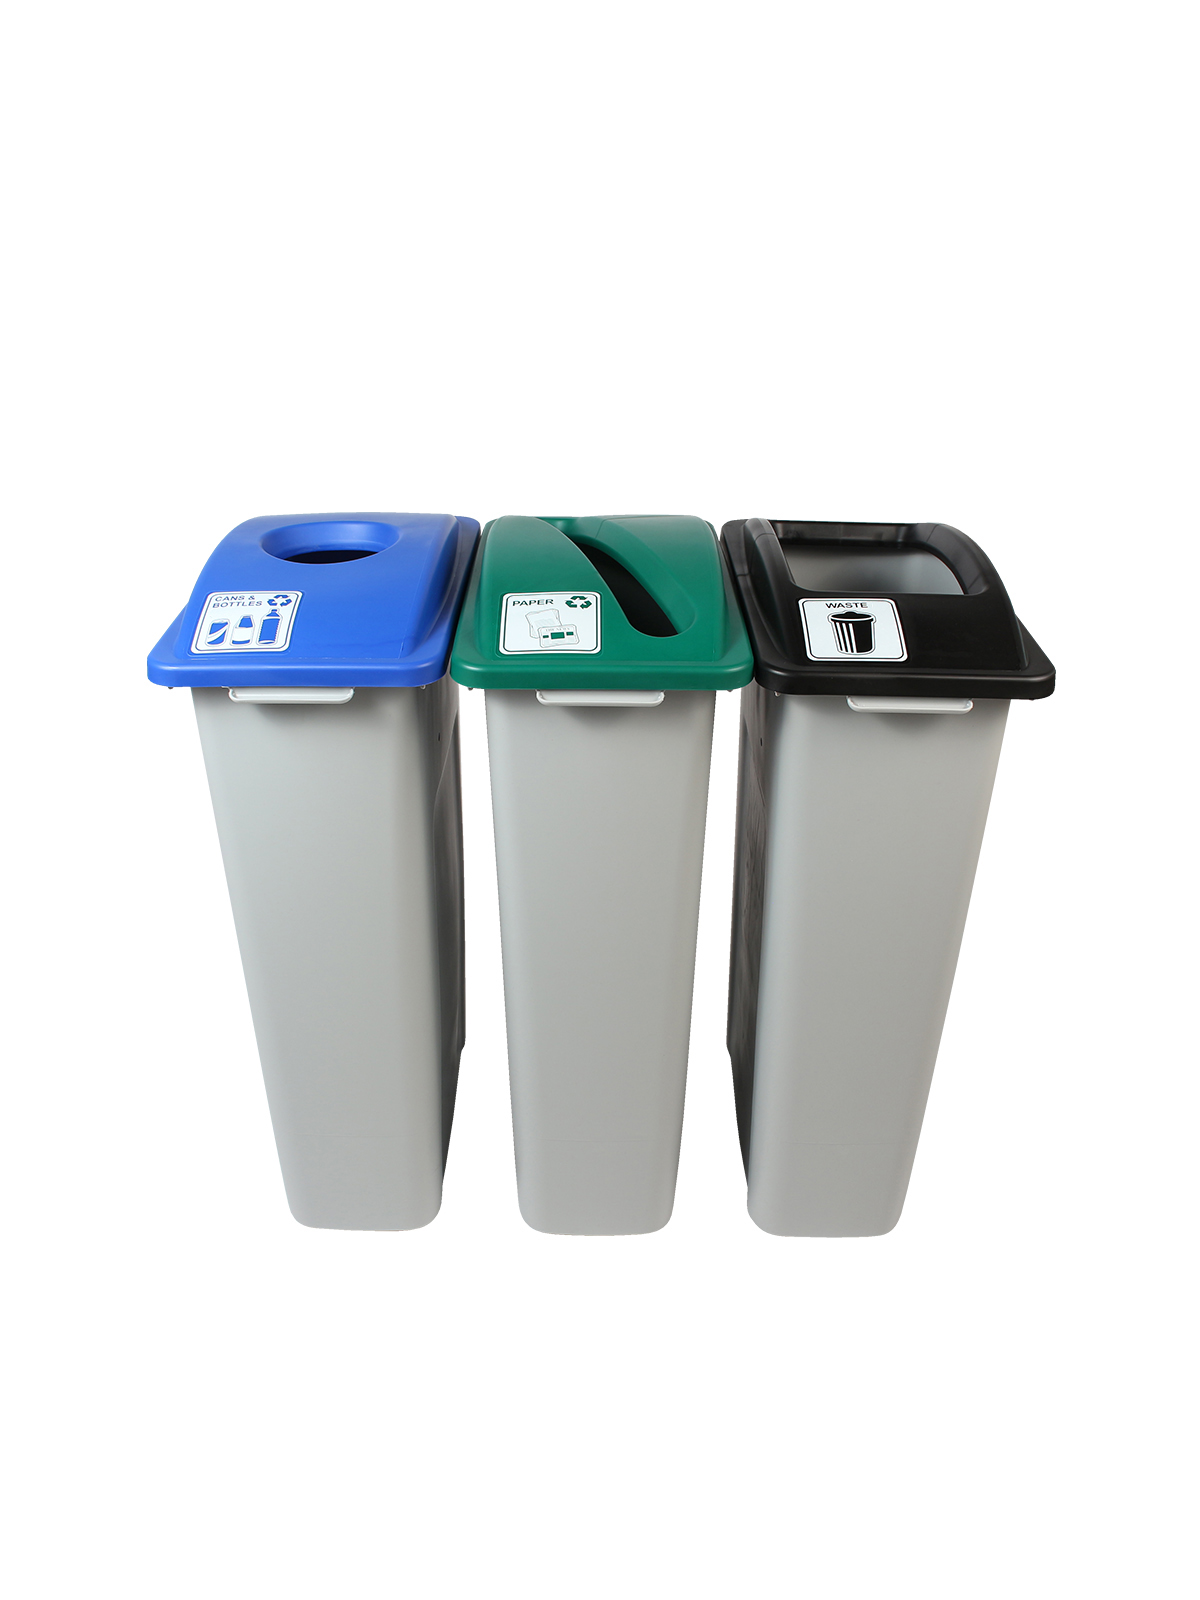 WASTE WATCHER - Triple - Cans & Bottles-Paper-Waste - Circle-Slot-Full - Grey-Blue-Green-Black